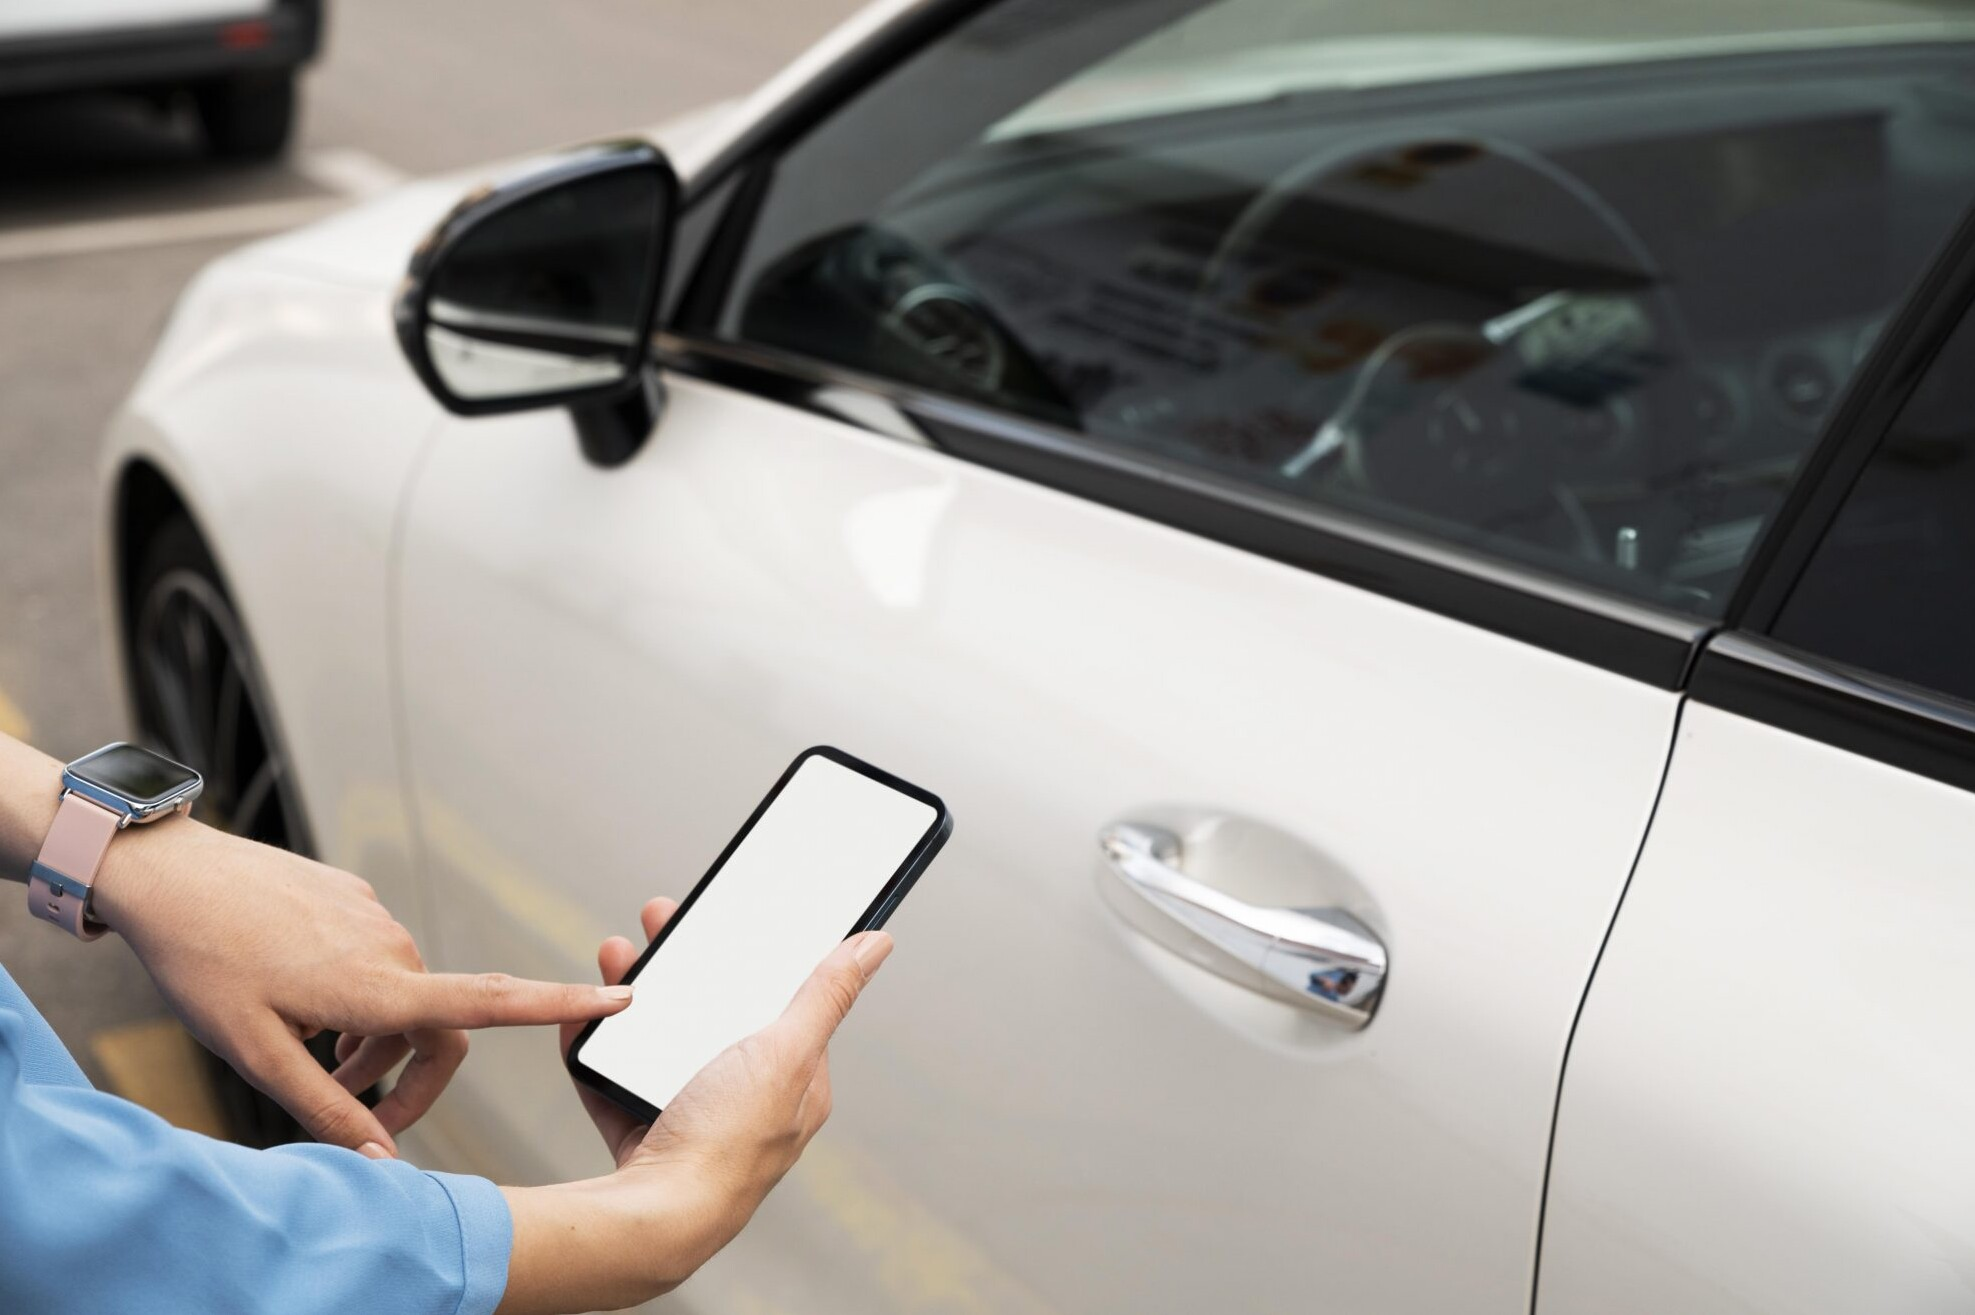 hand-using-phone-lock-car-e1631714679533